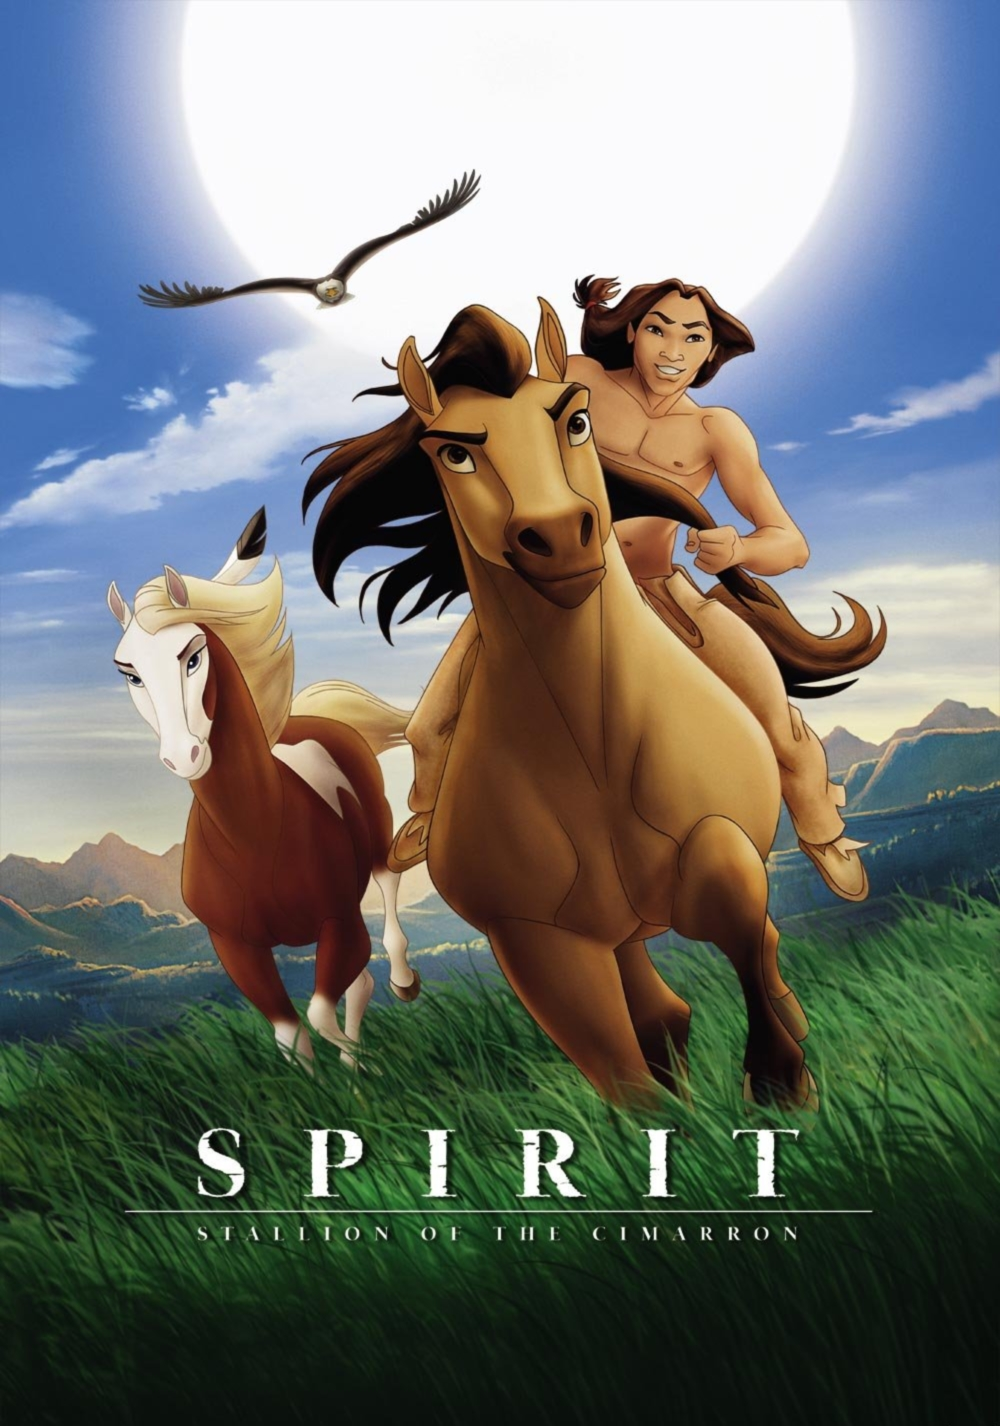 دانلود انيميشن اسپریت: نریان سیمارون Spirit: Stallion of the Cimarron 2002